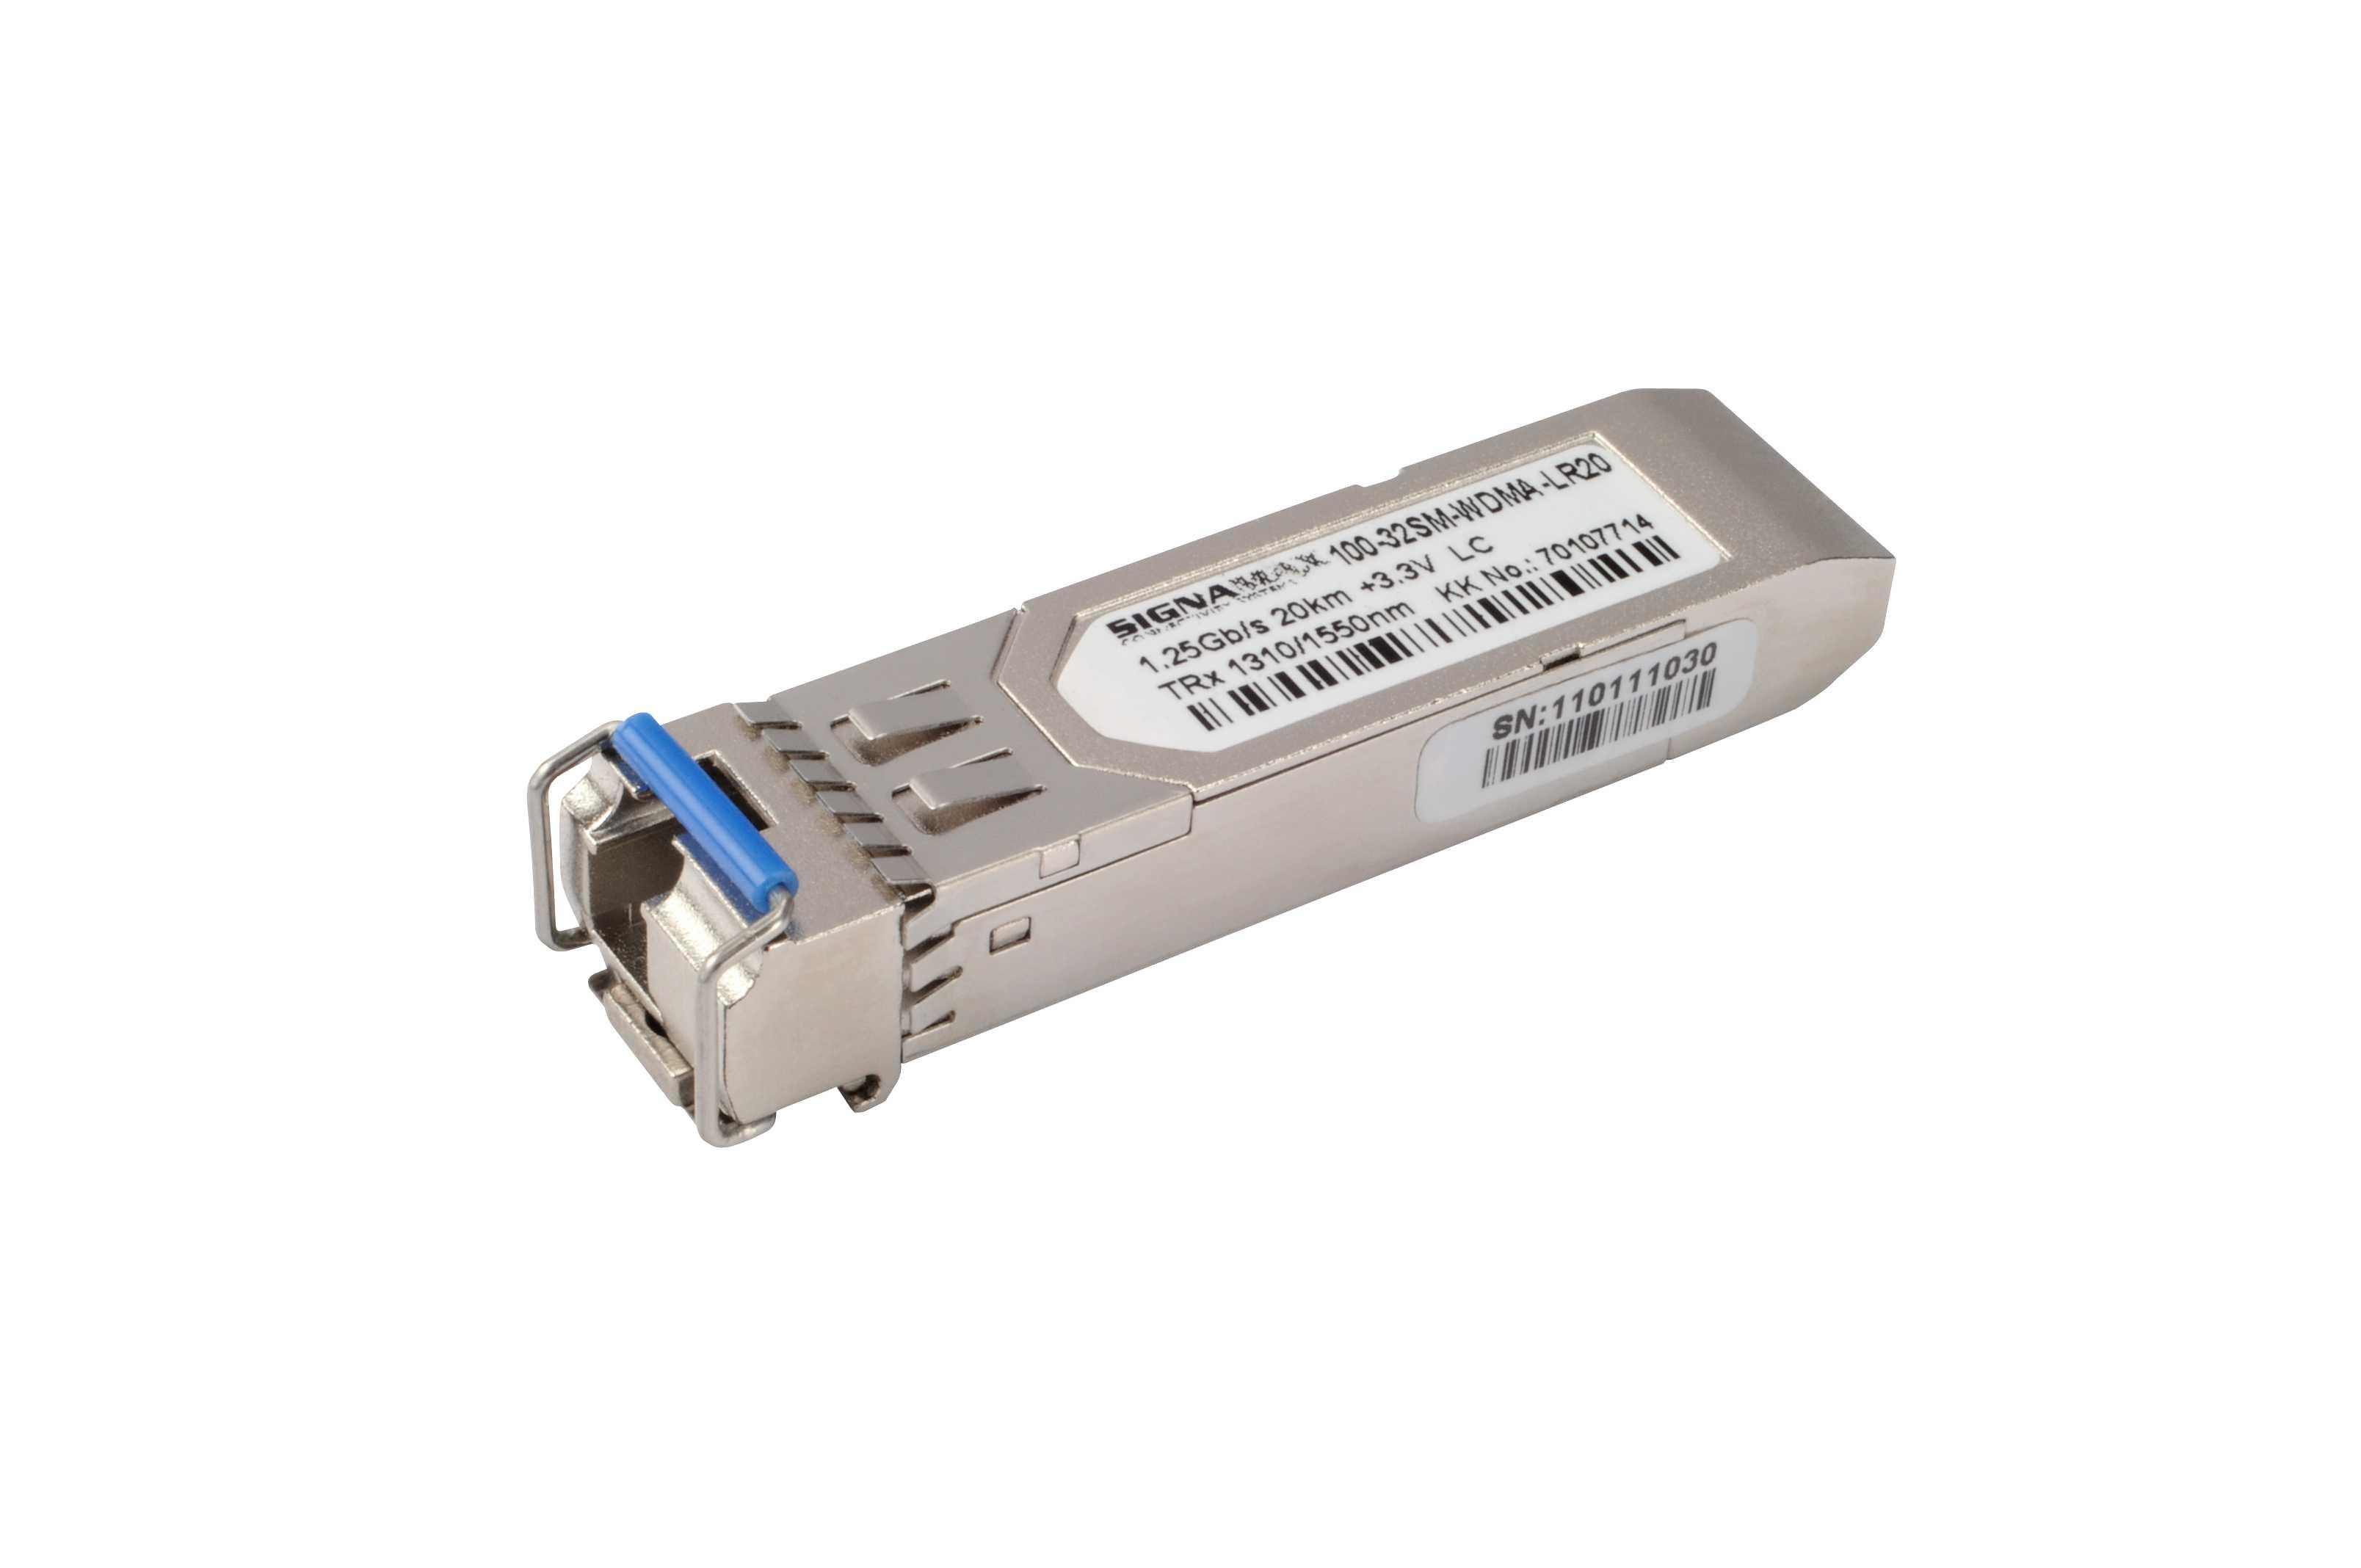 Signamax 100-32WDMA-LR20 1G SFP optický WDM modul SM 1310nm LC, 20km, DDM - Cisco komp.